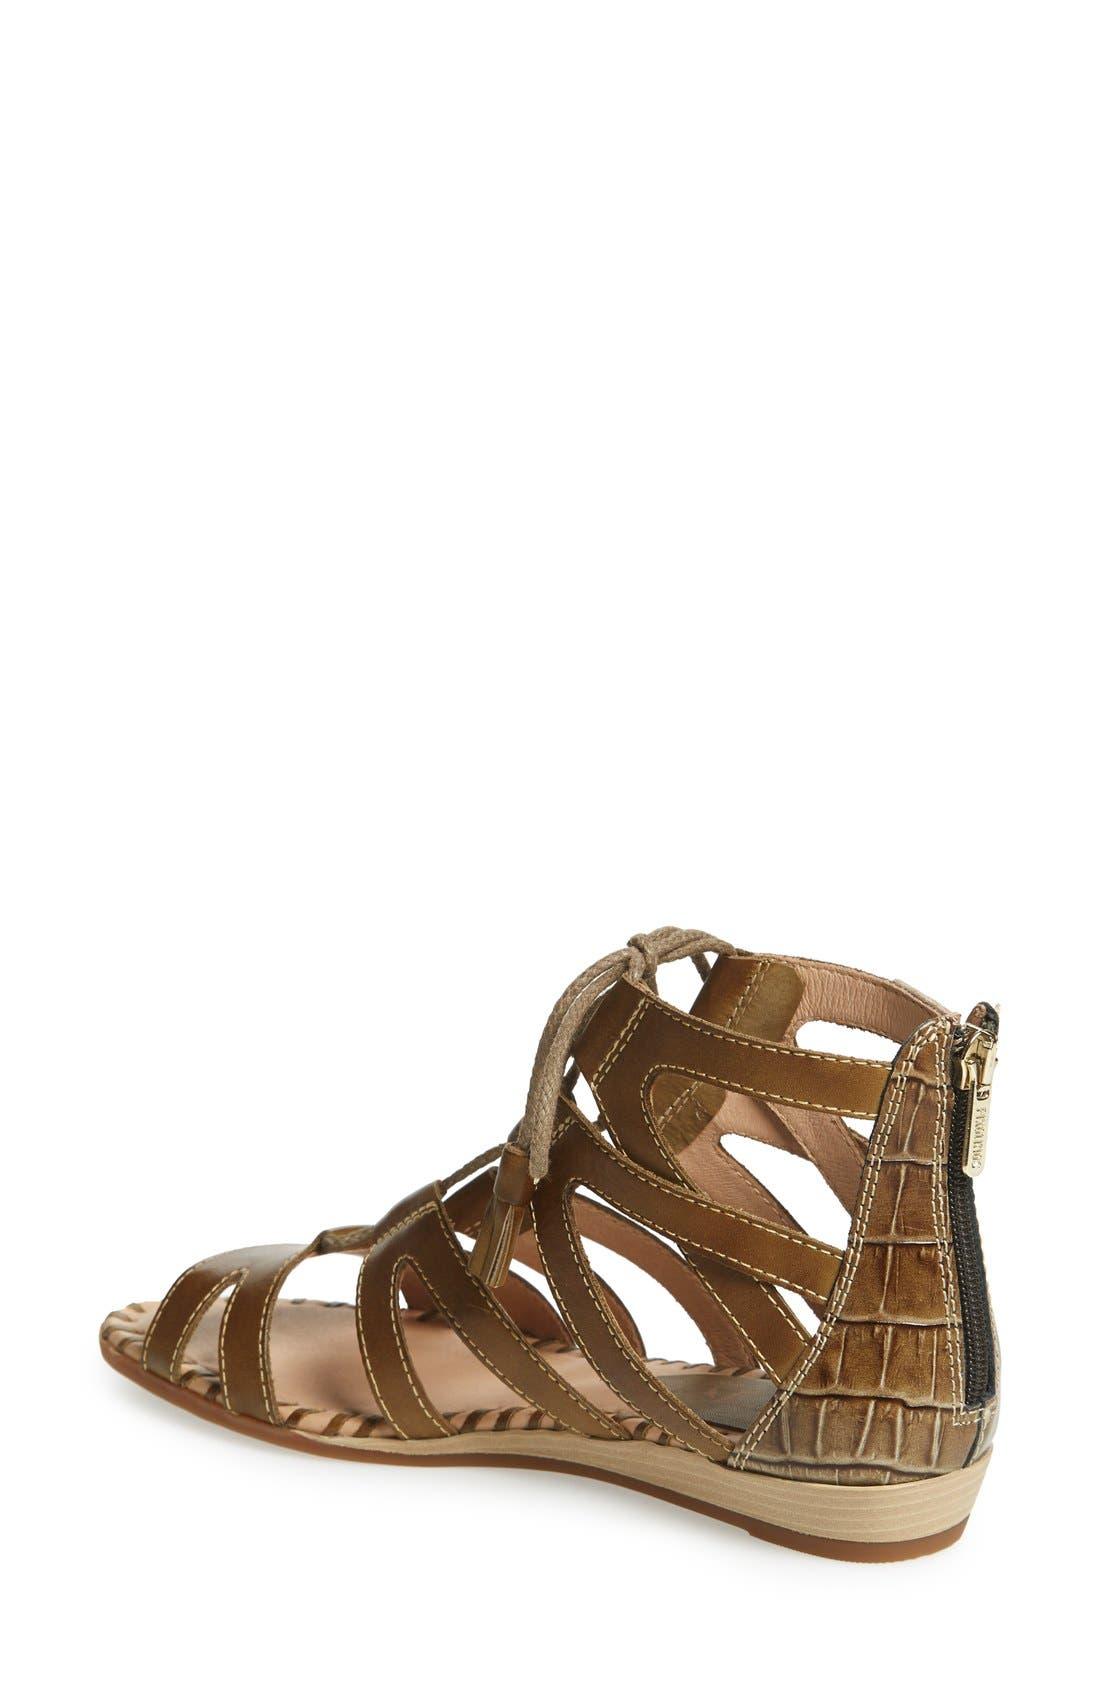 'Alcudia' Lace-Up Sandal,                             Alternate thumbnail 6, color,